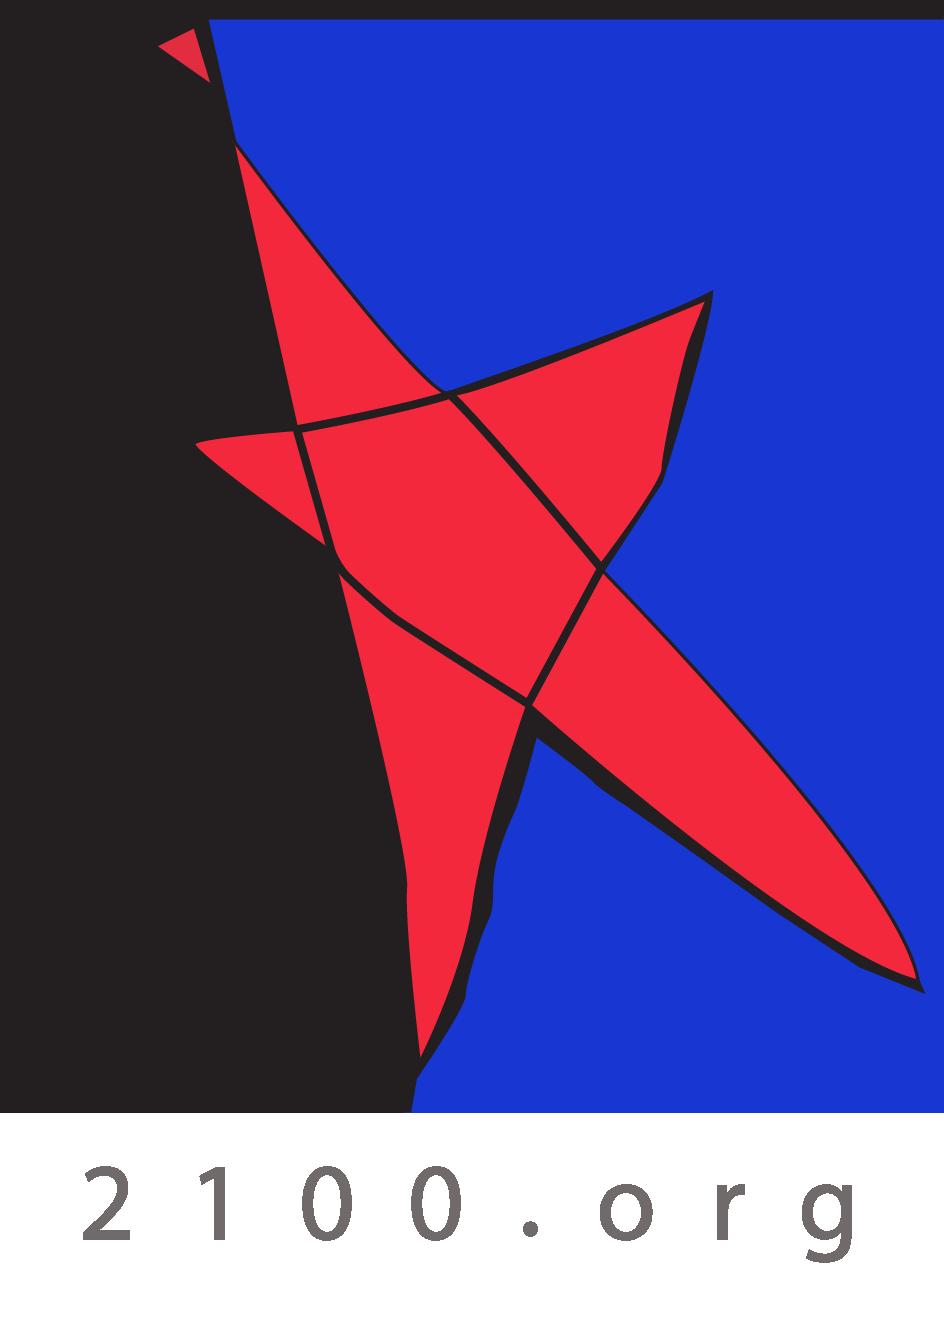 Fondation 2100 logo